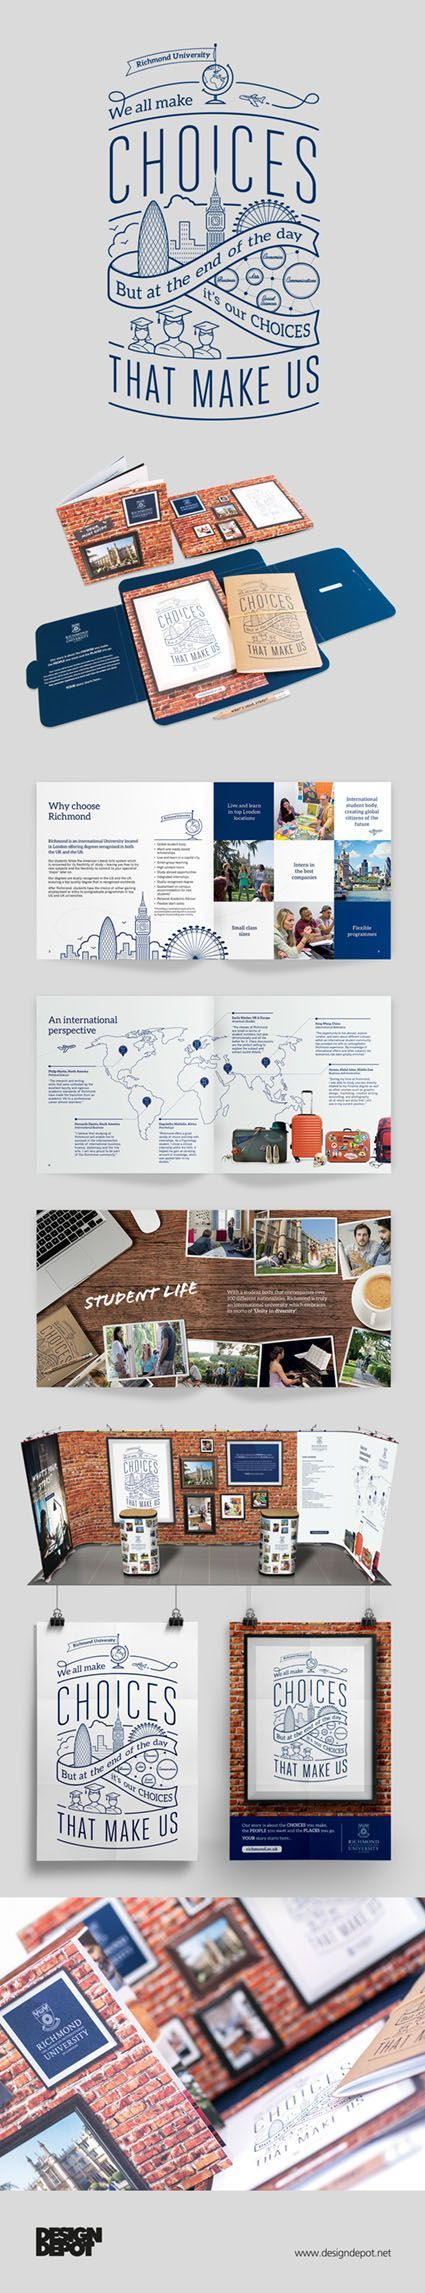 Richmond artwork, London, university, identity, welcome pack, branding, design…